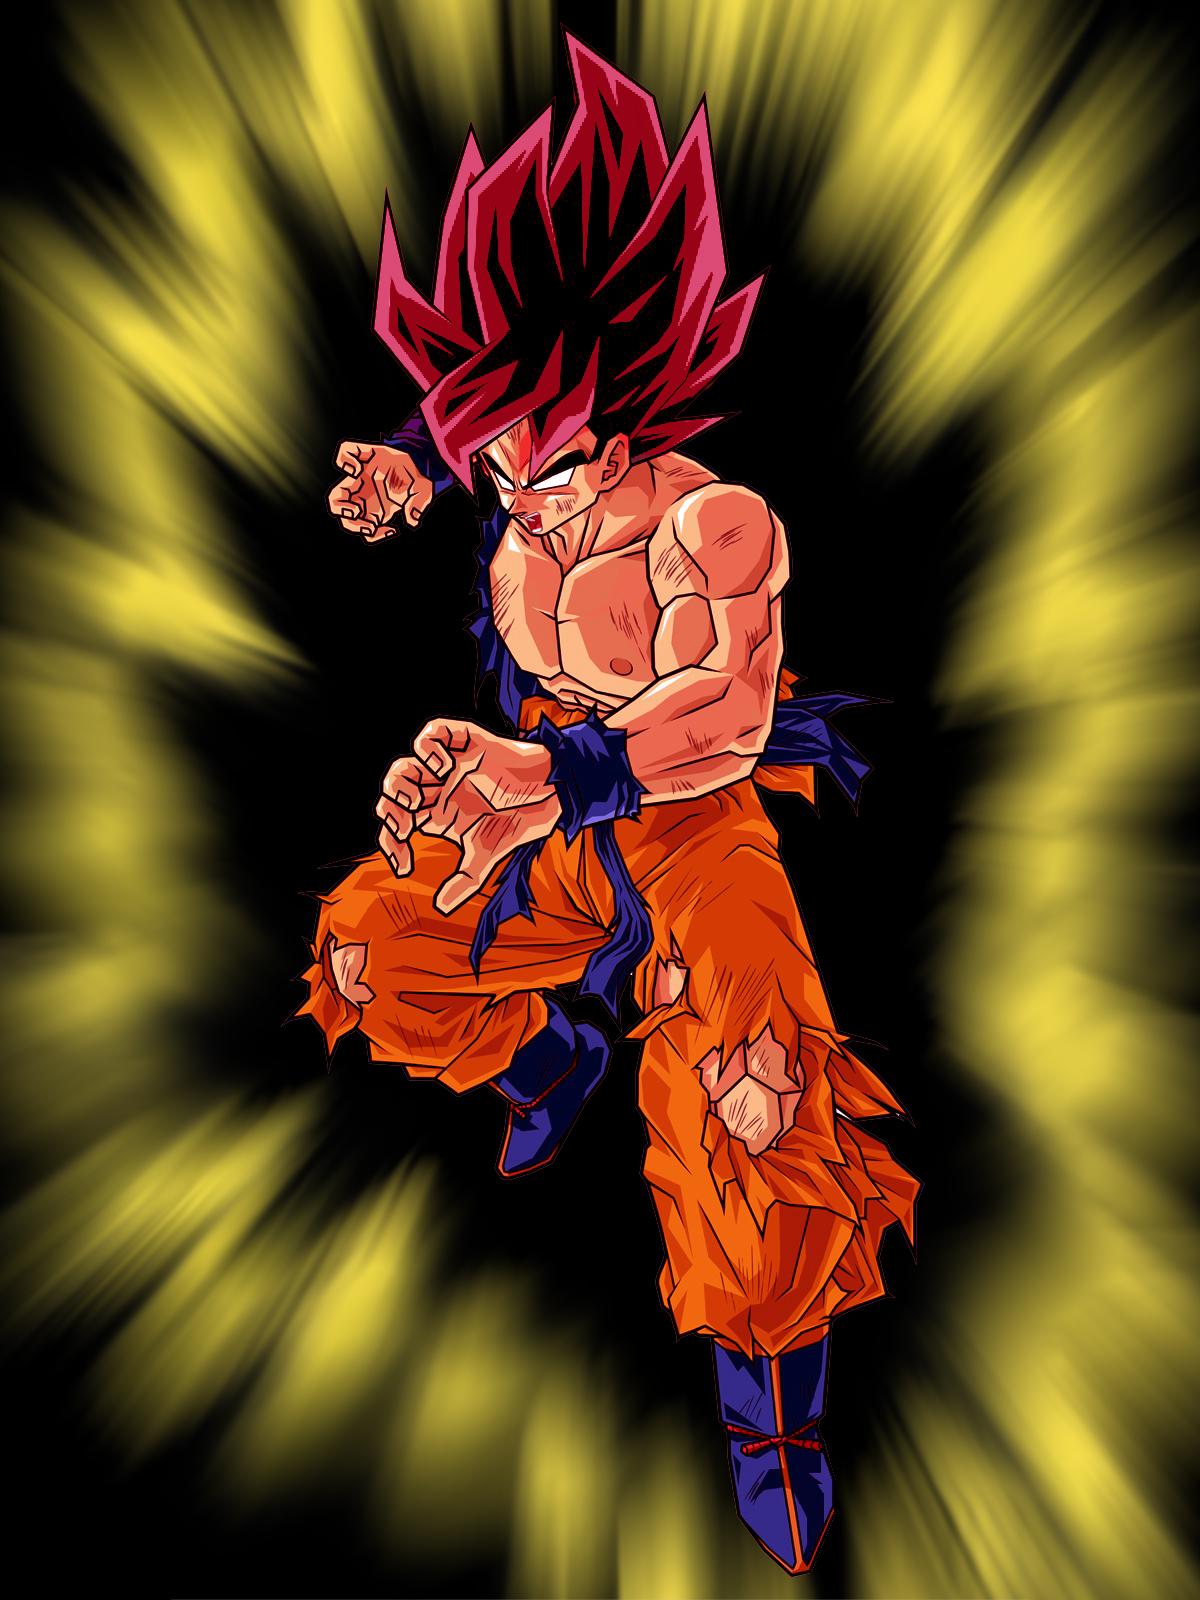 Dragon ball z battle of gods movie anime discussion onemanga forums - Goku super sayen ...